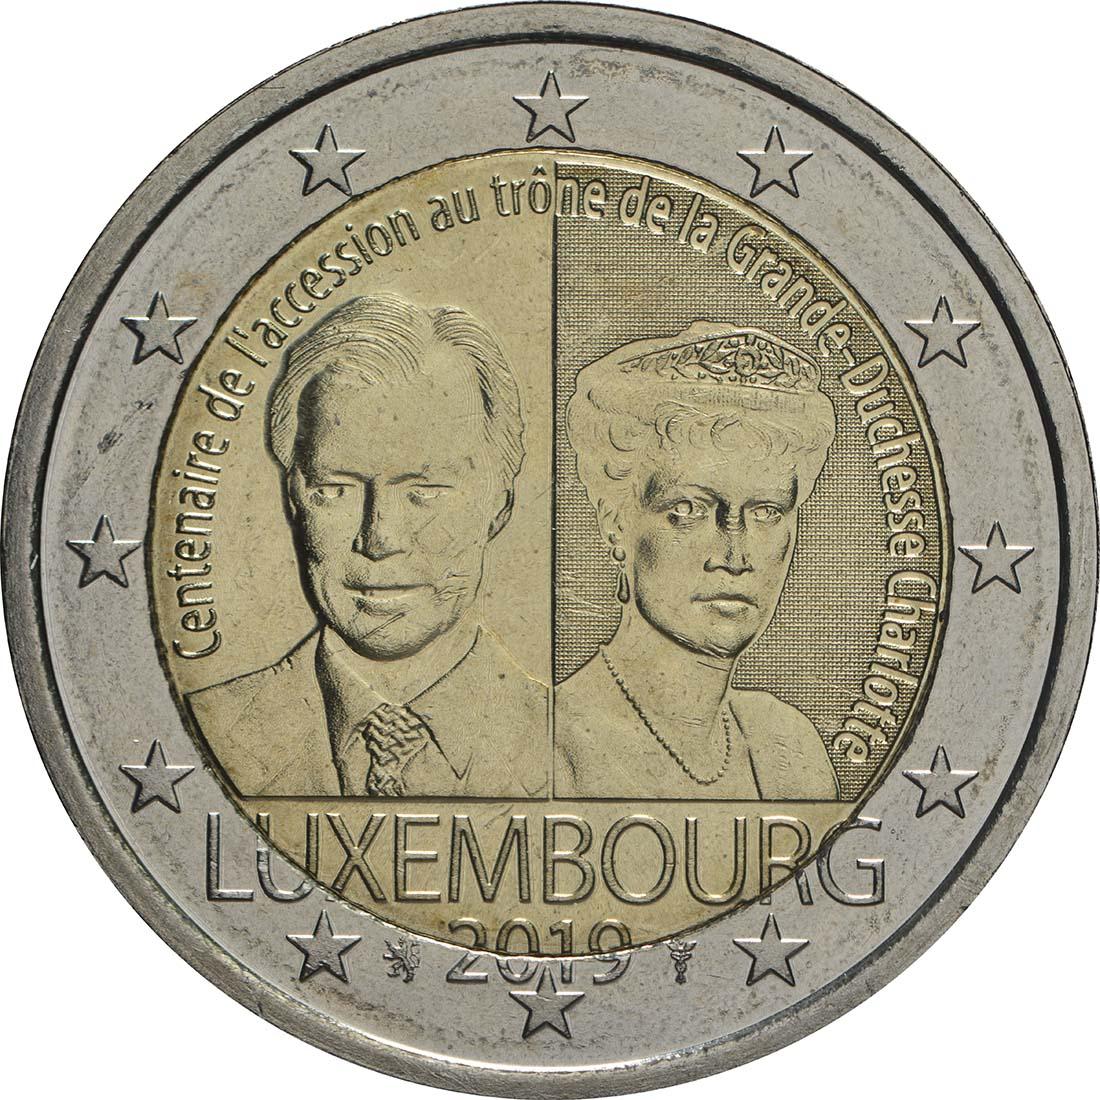 2019 332 Luxemburg Charlotte.jpg